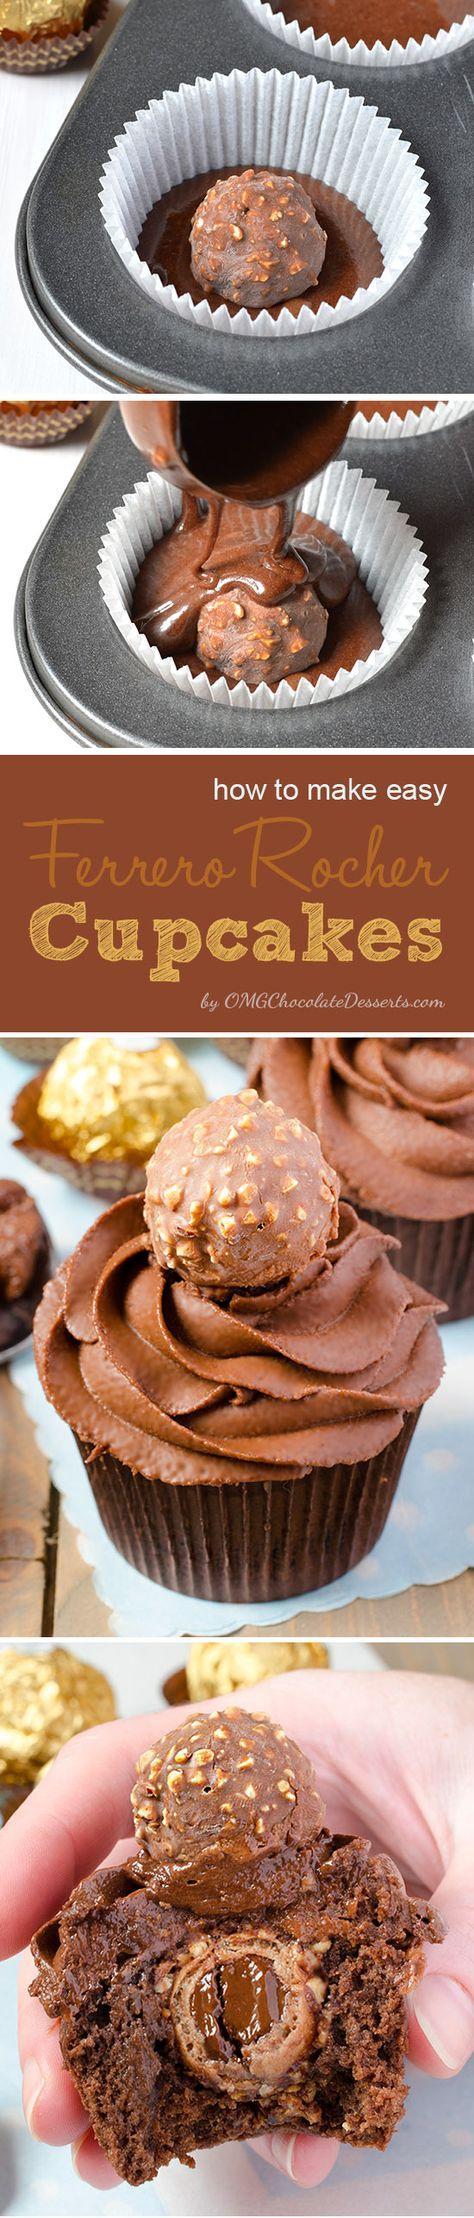 Ferrero Rocher Cupcakes   http://OMGChocolateDesserts.com   #chocolate #cupcakes #desserts